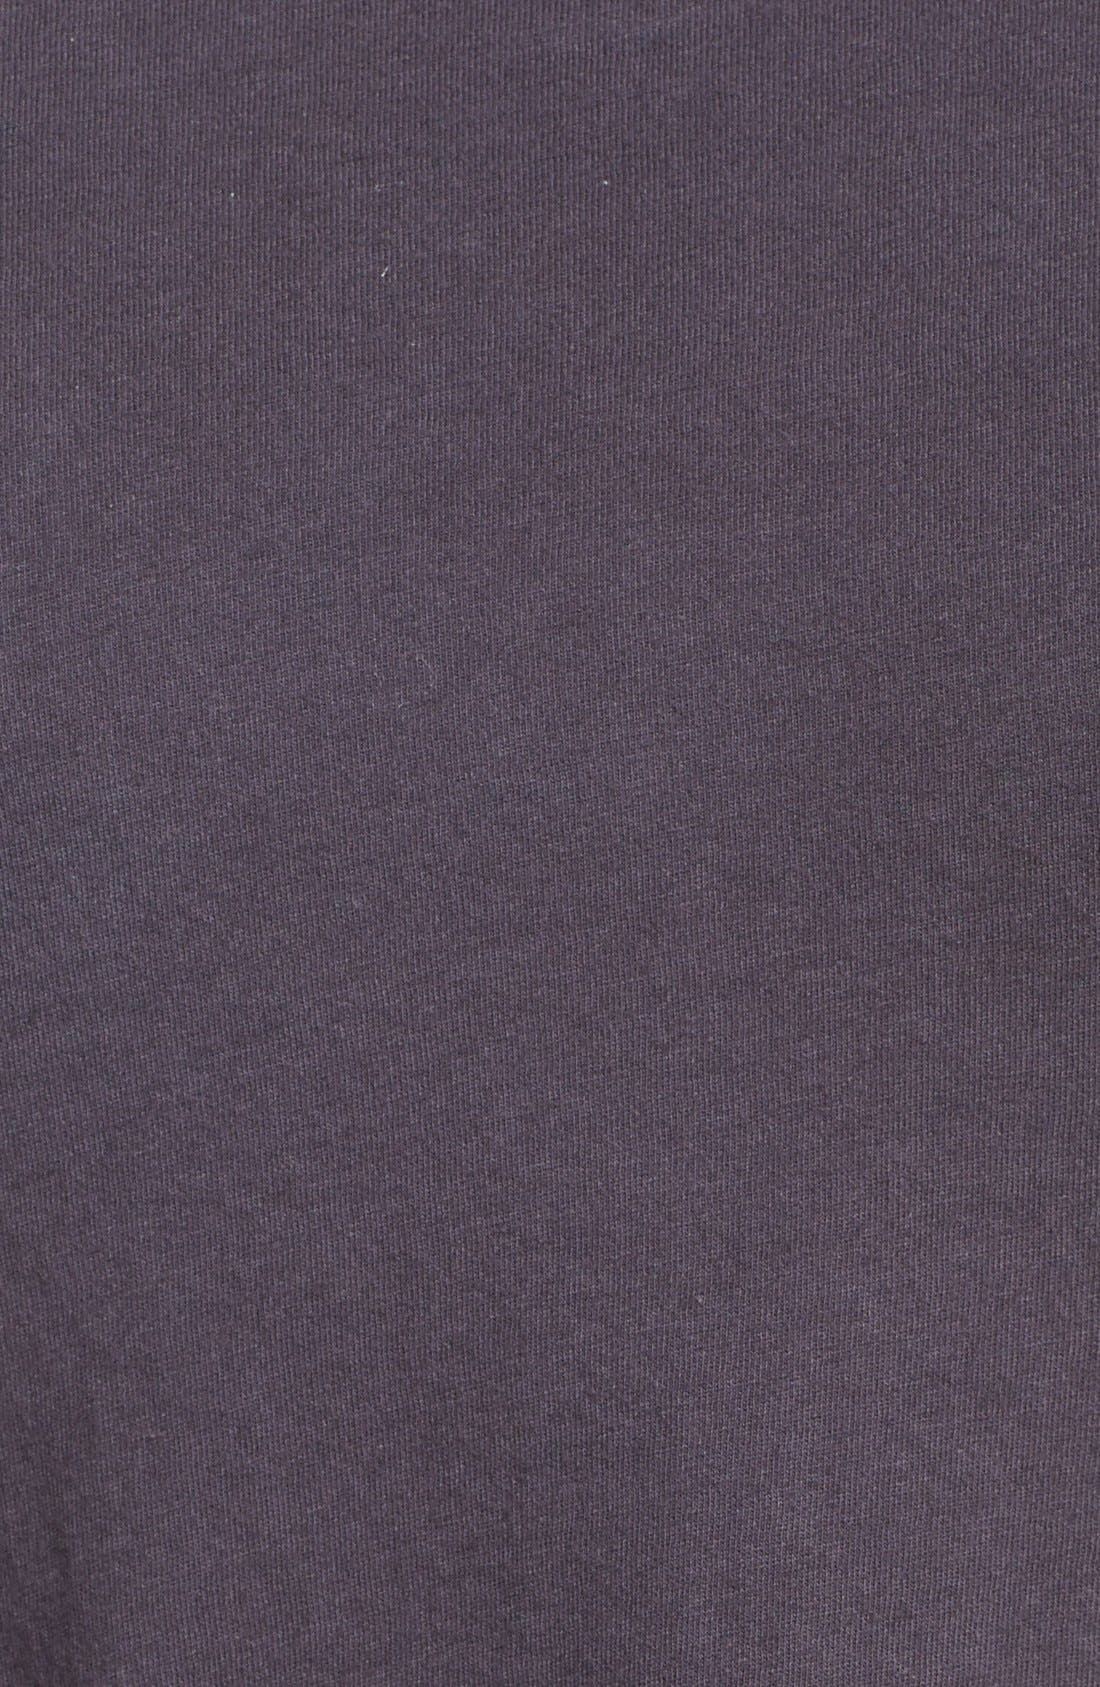 Alternate Image 3  - Tildon 'Baby' Crop Cotton Tee